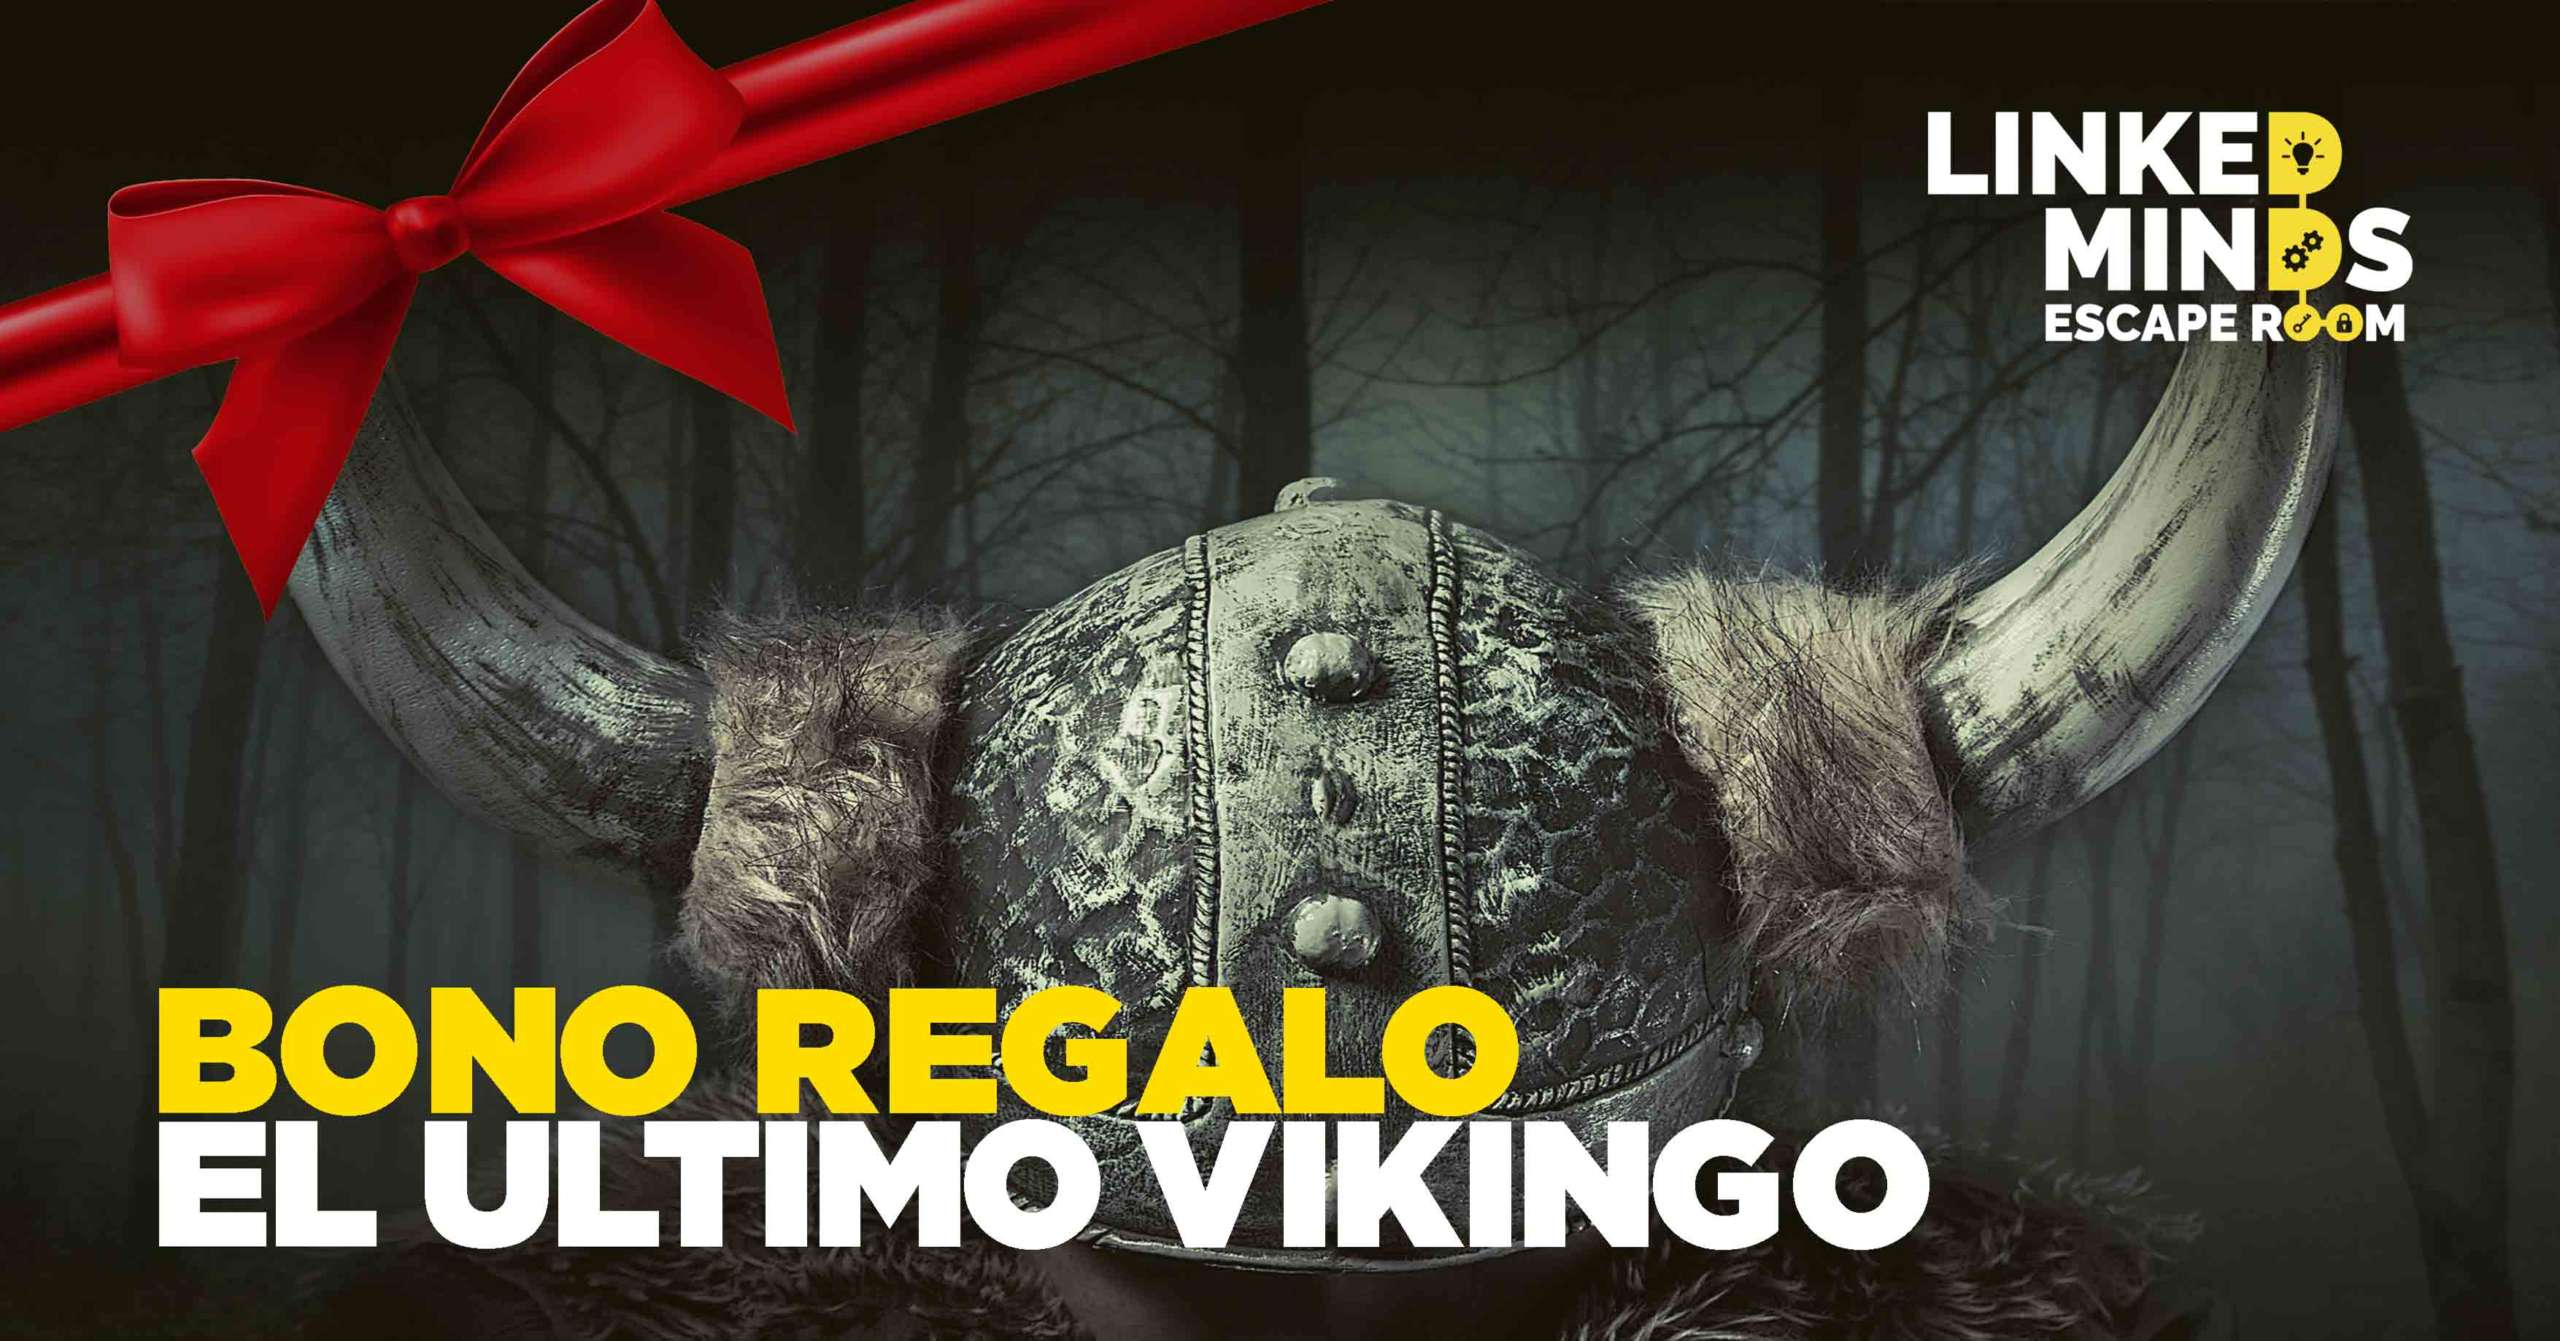 linked minds el ultimo vikingo bono regalo escape room madrid